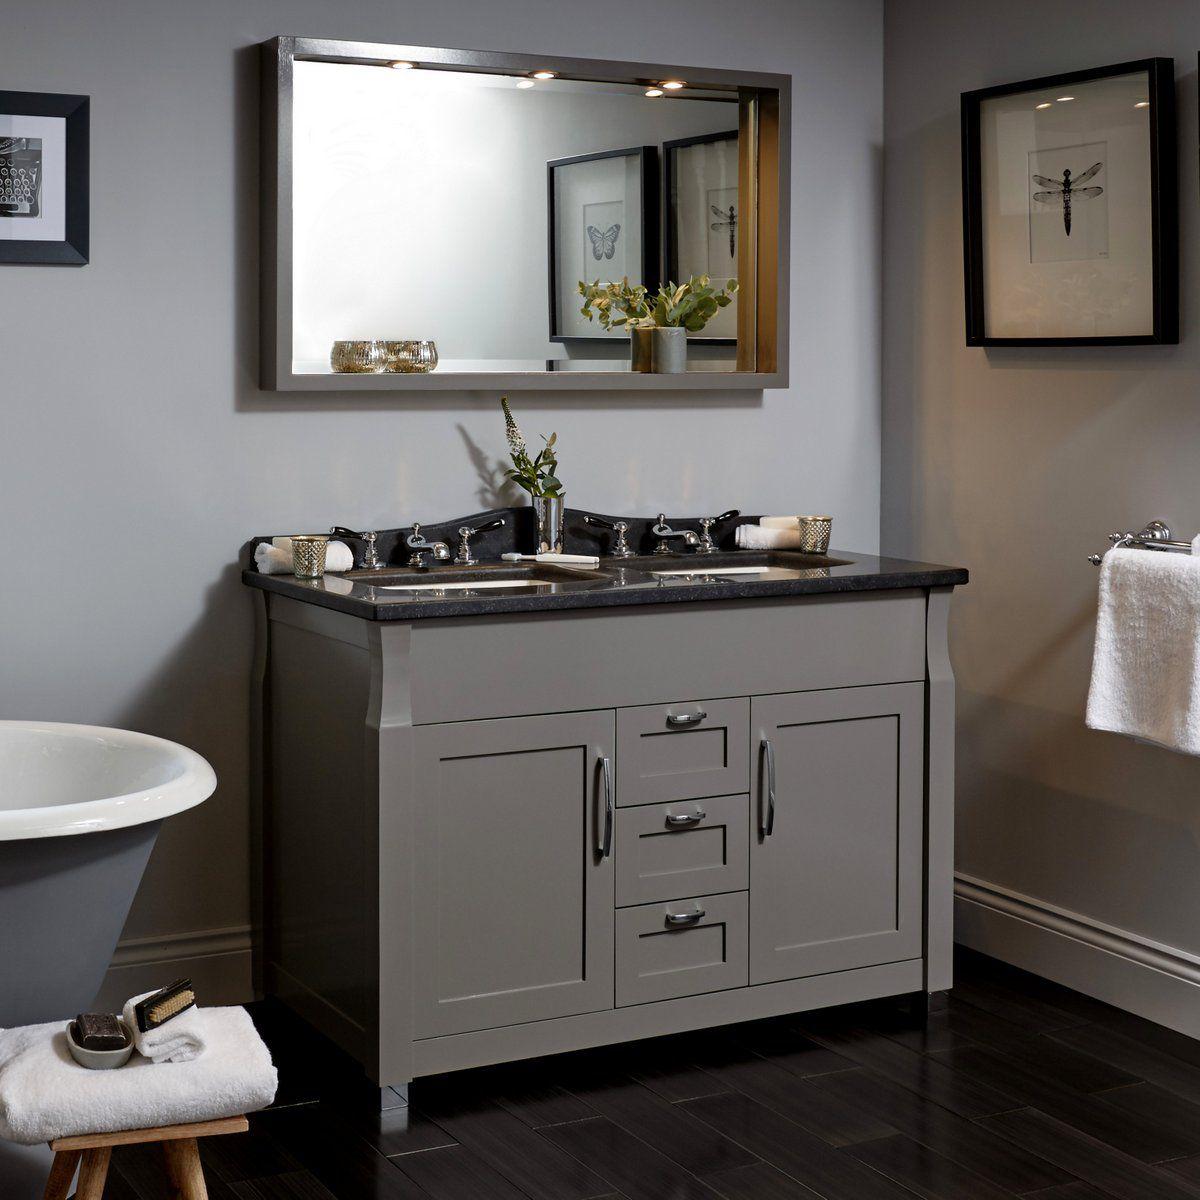 Imperial Radcliffe Westbury Twin 2 Door Vanity With 3 Drawers Uk